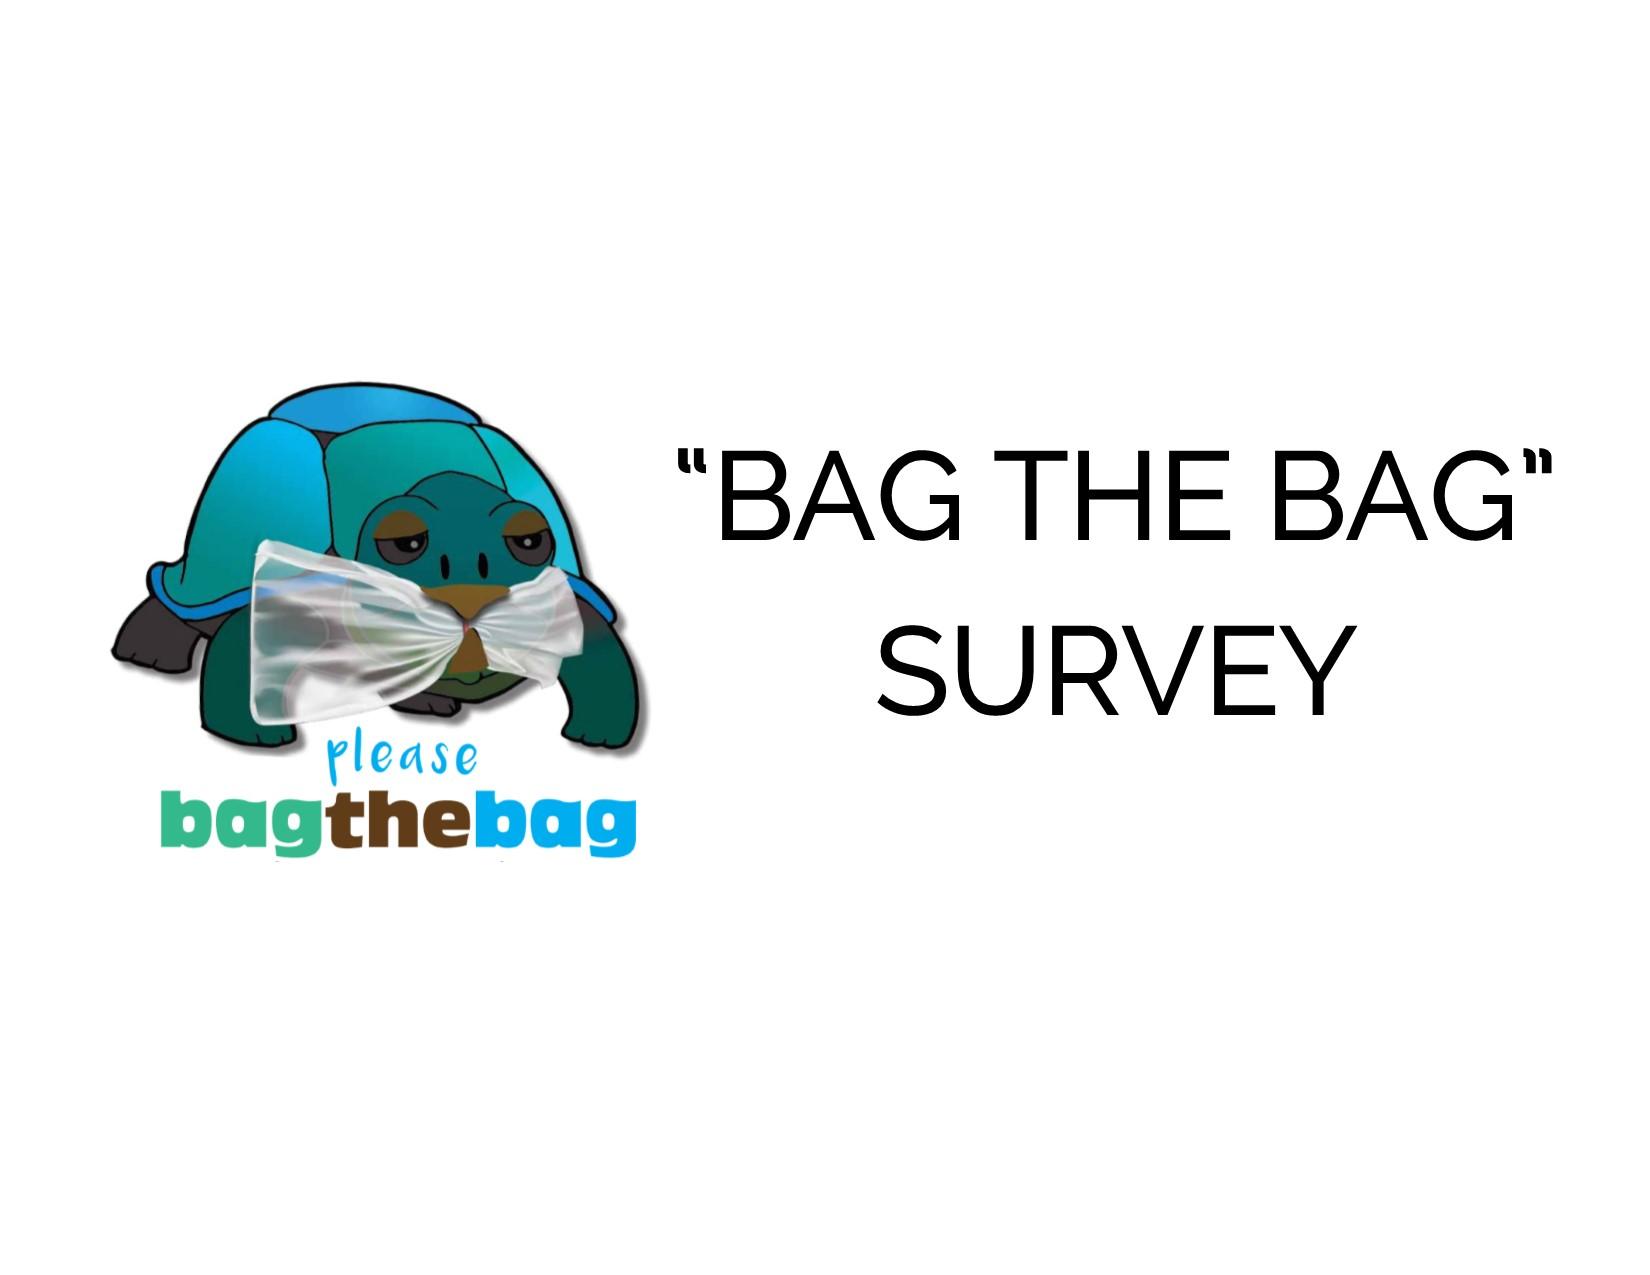 Bag The Bag Survey